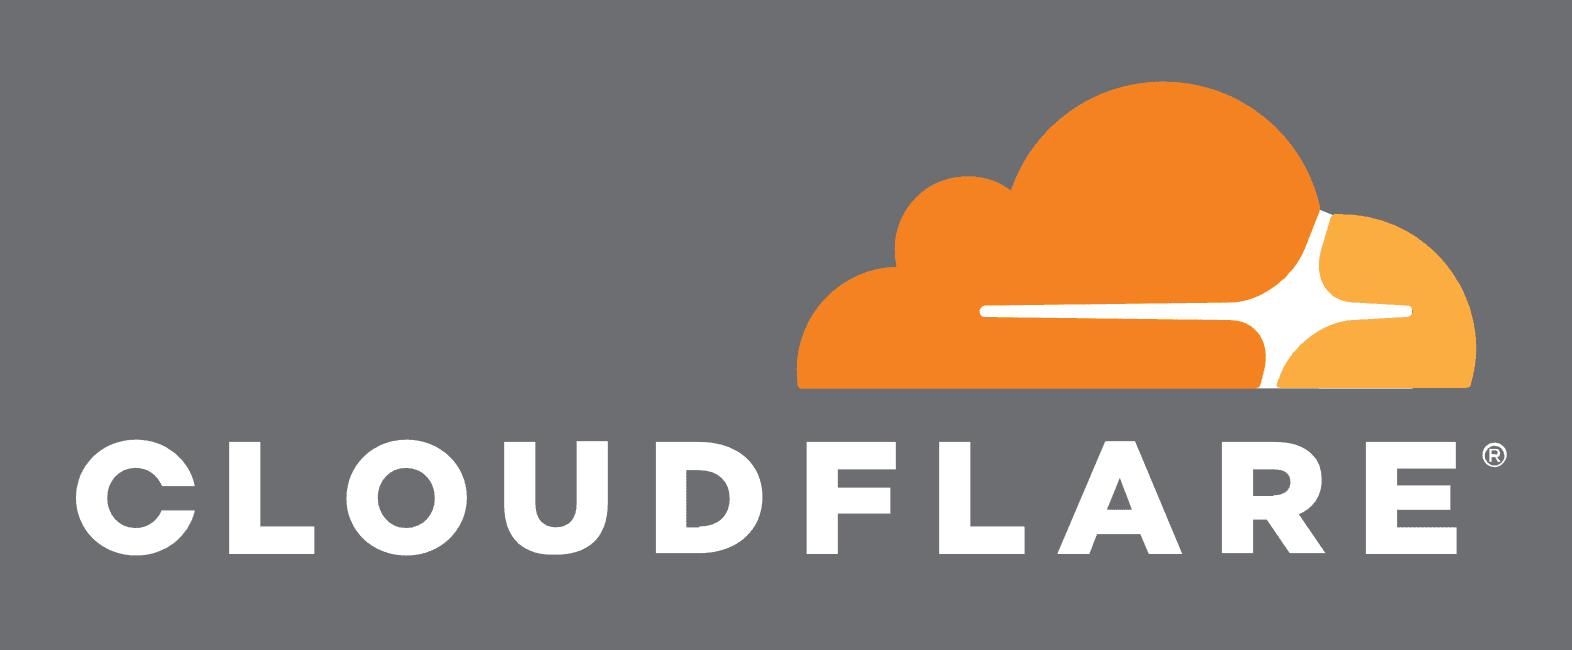 cloudflare torrent sites